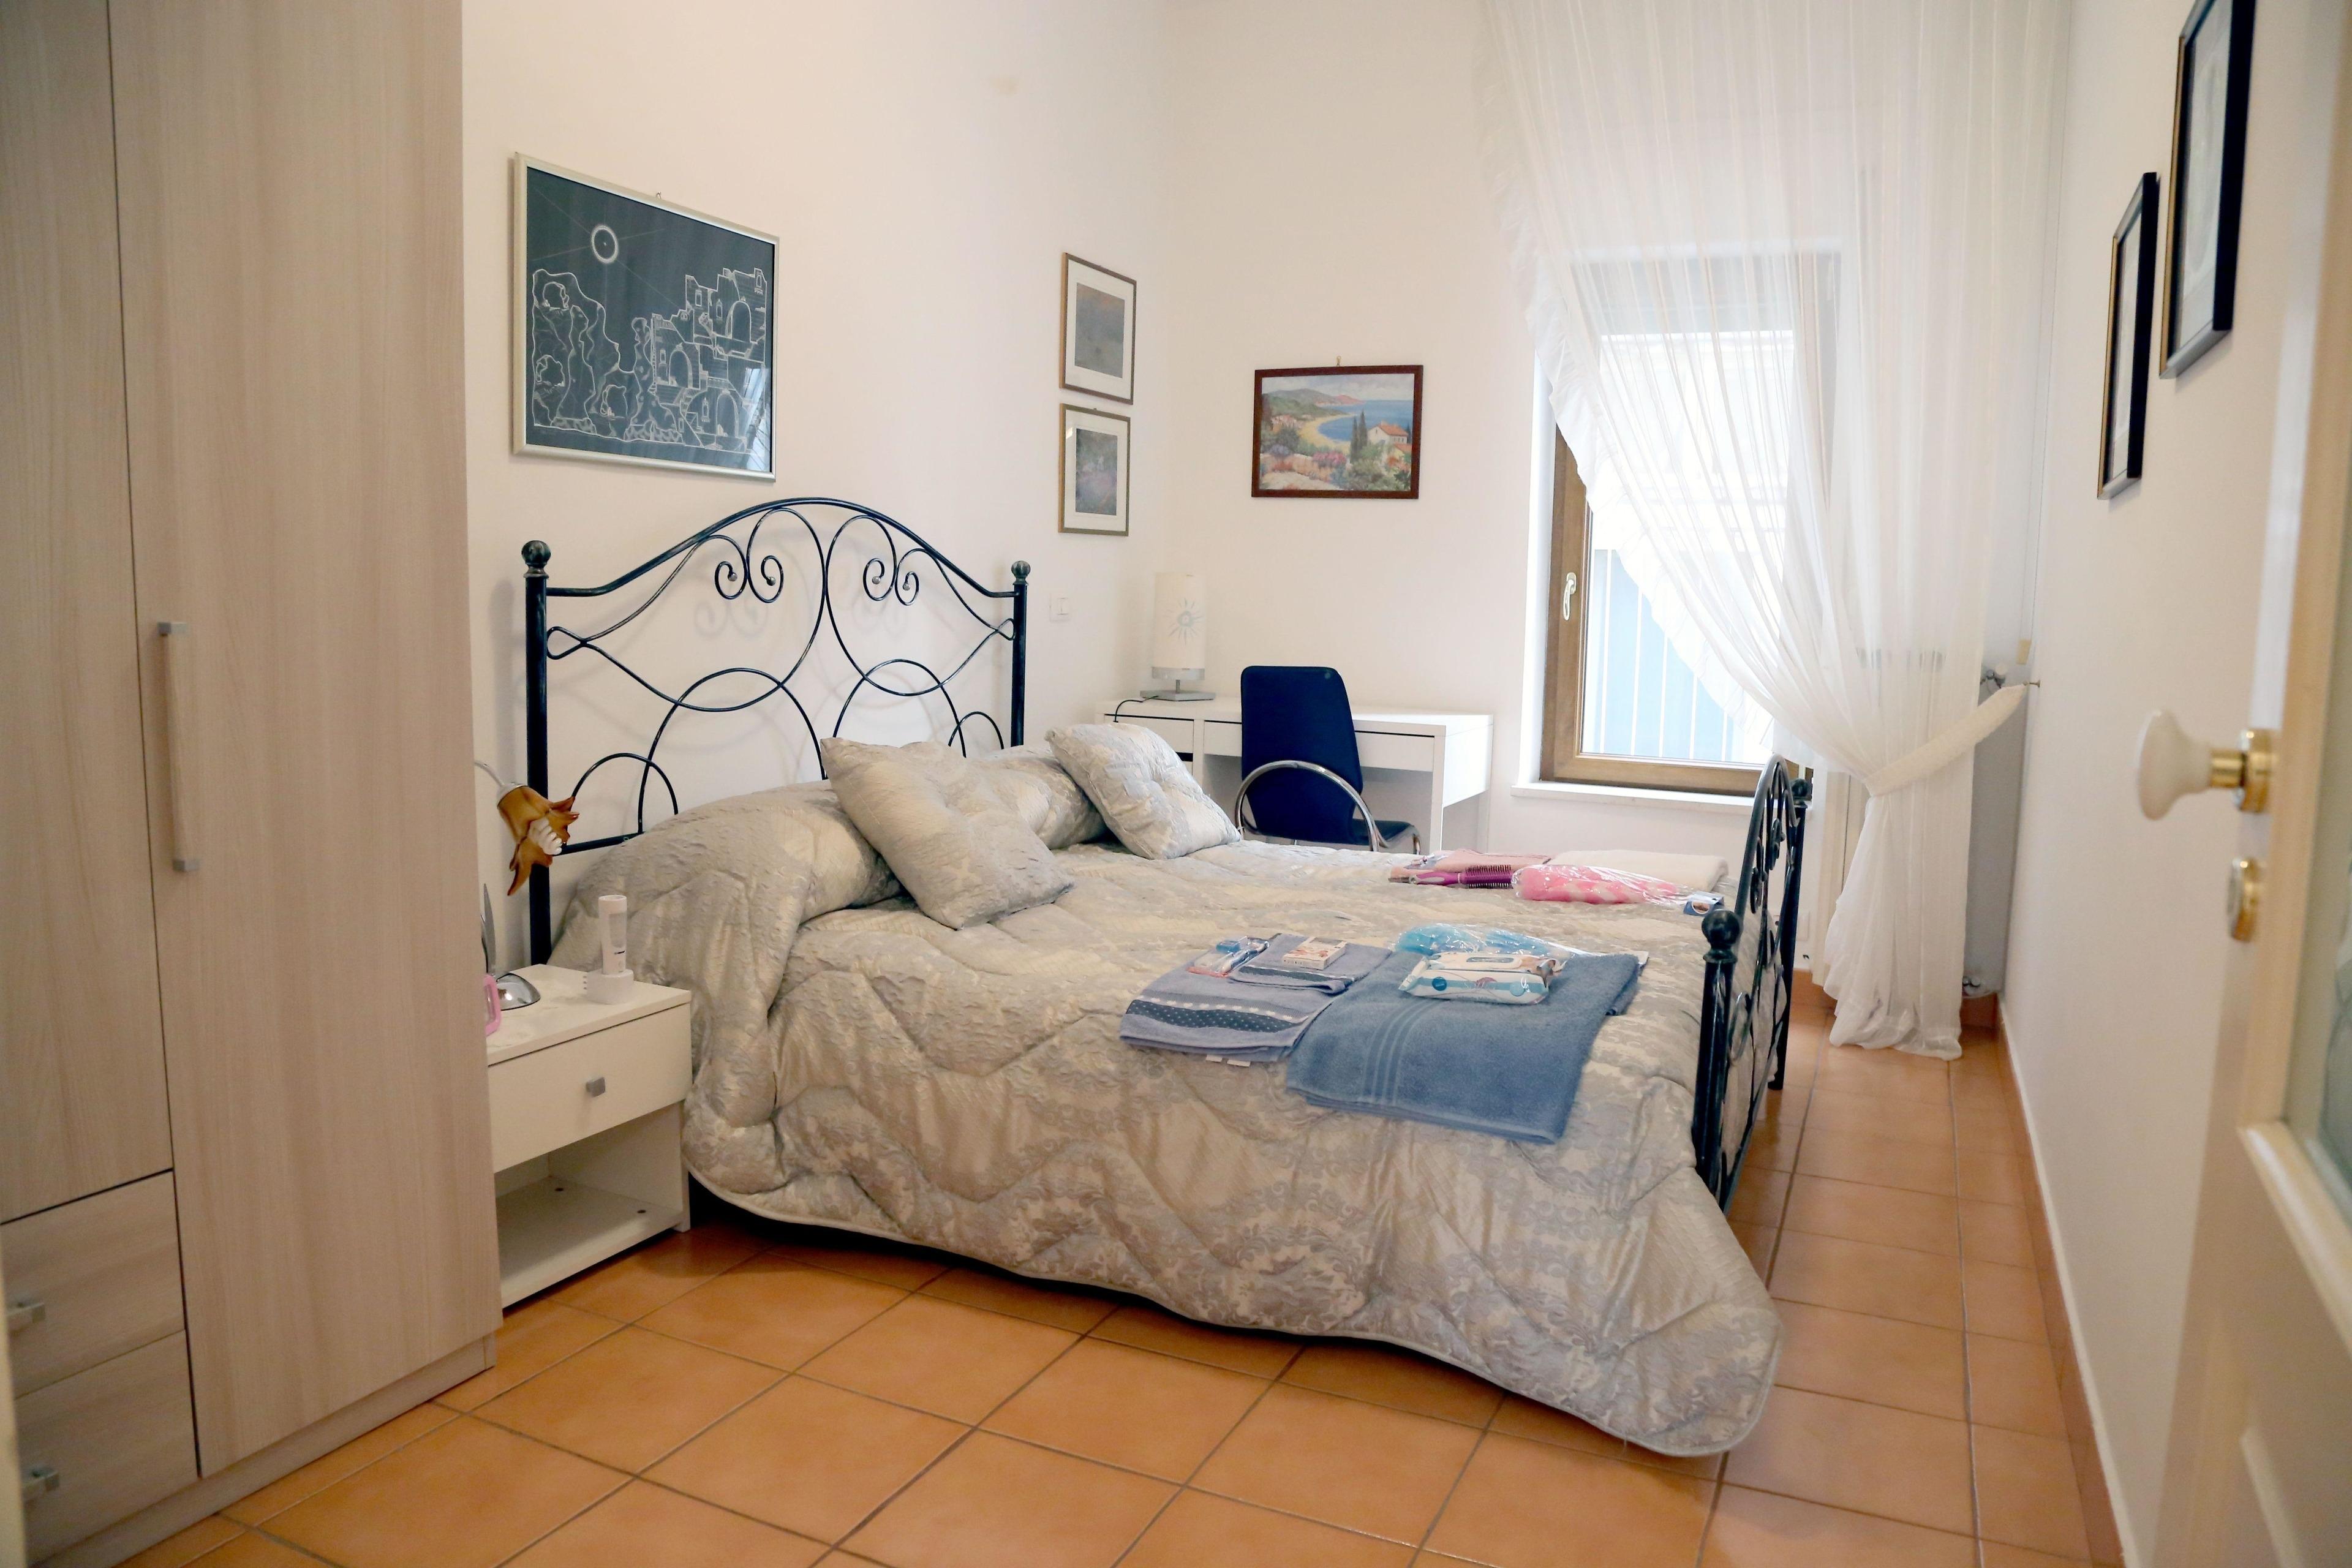 Ferienhaus LA CASA DEI PARGOLI (2516888), Matera, Matera, Basilikata, Italien, Bild 13